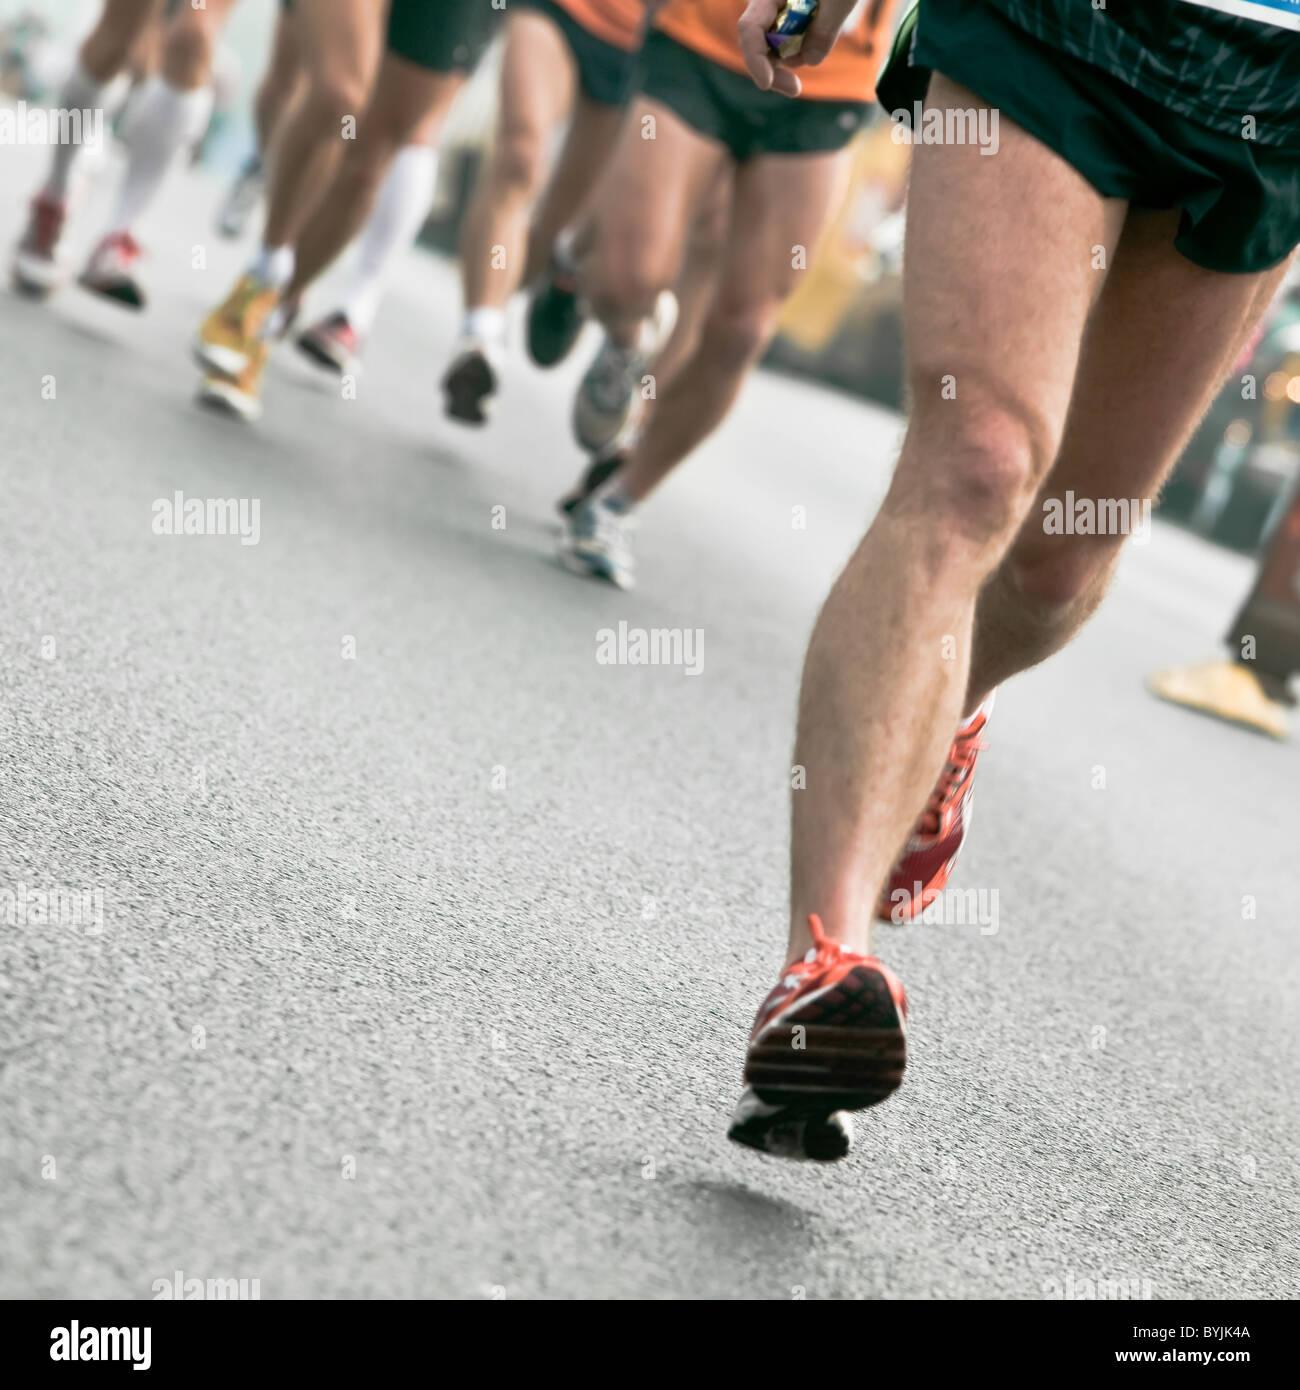 Man running in city marathon Photo Stock